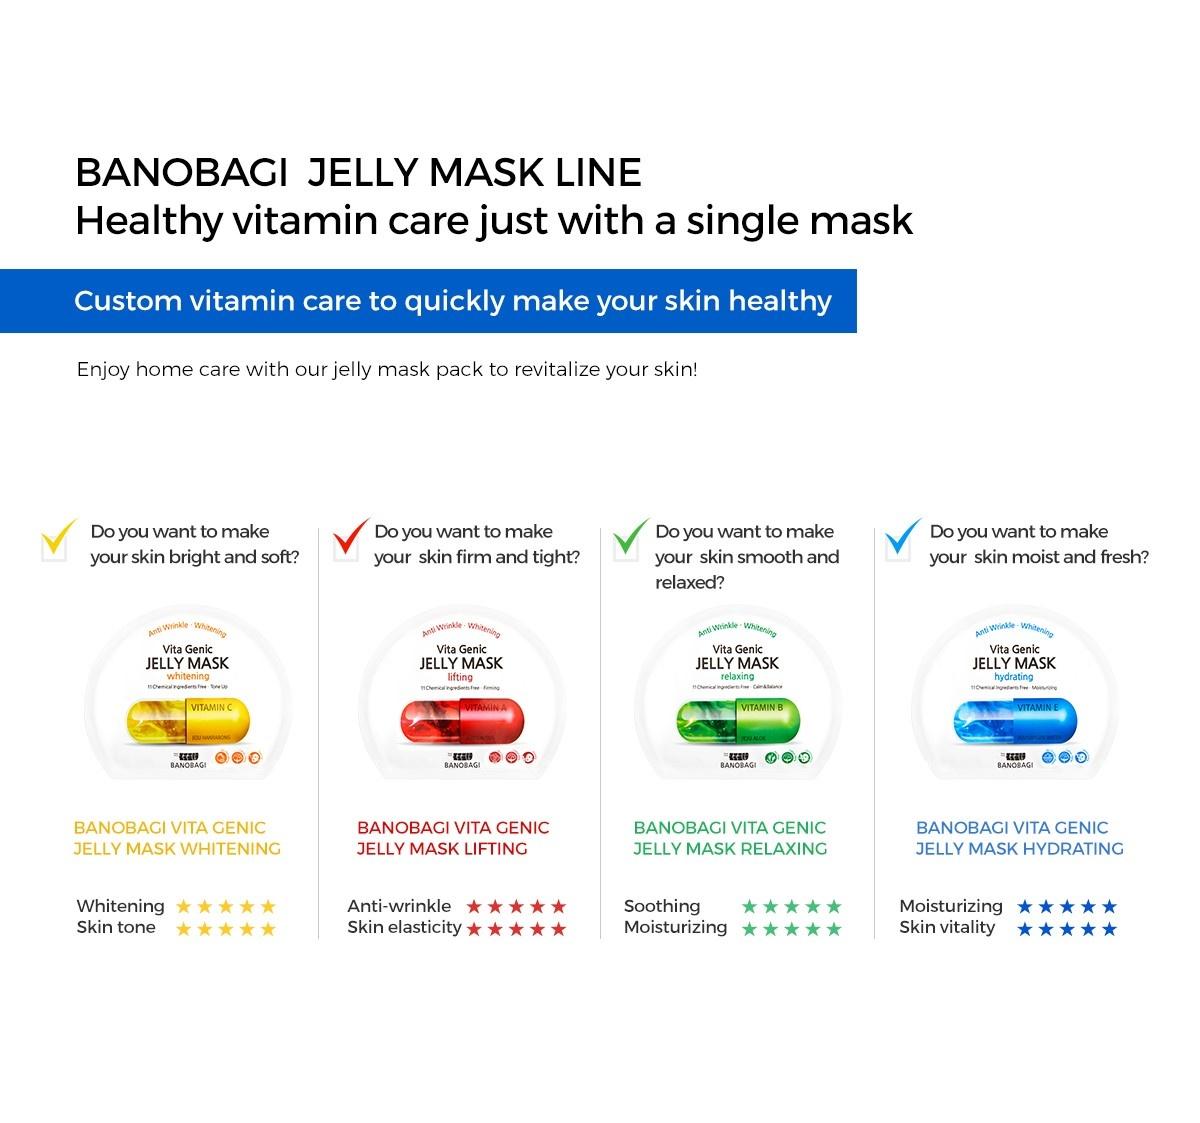 Vita Genic Jelly Mask Hydrating-6